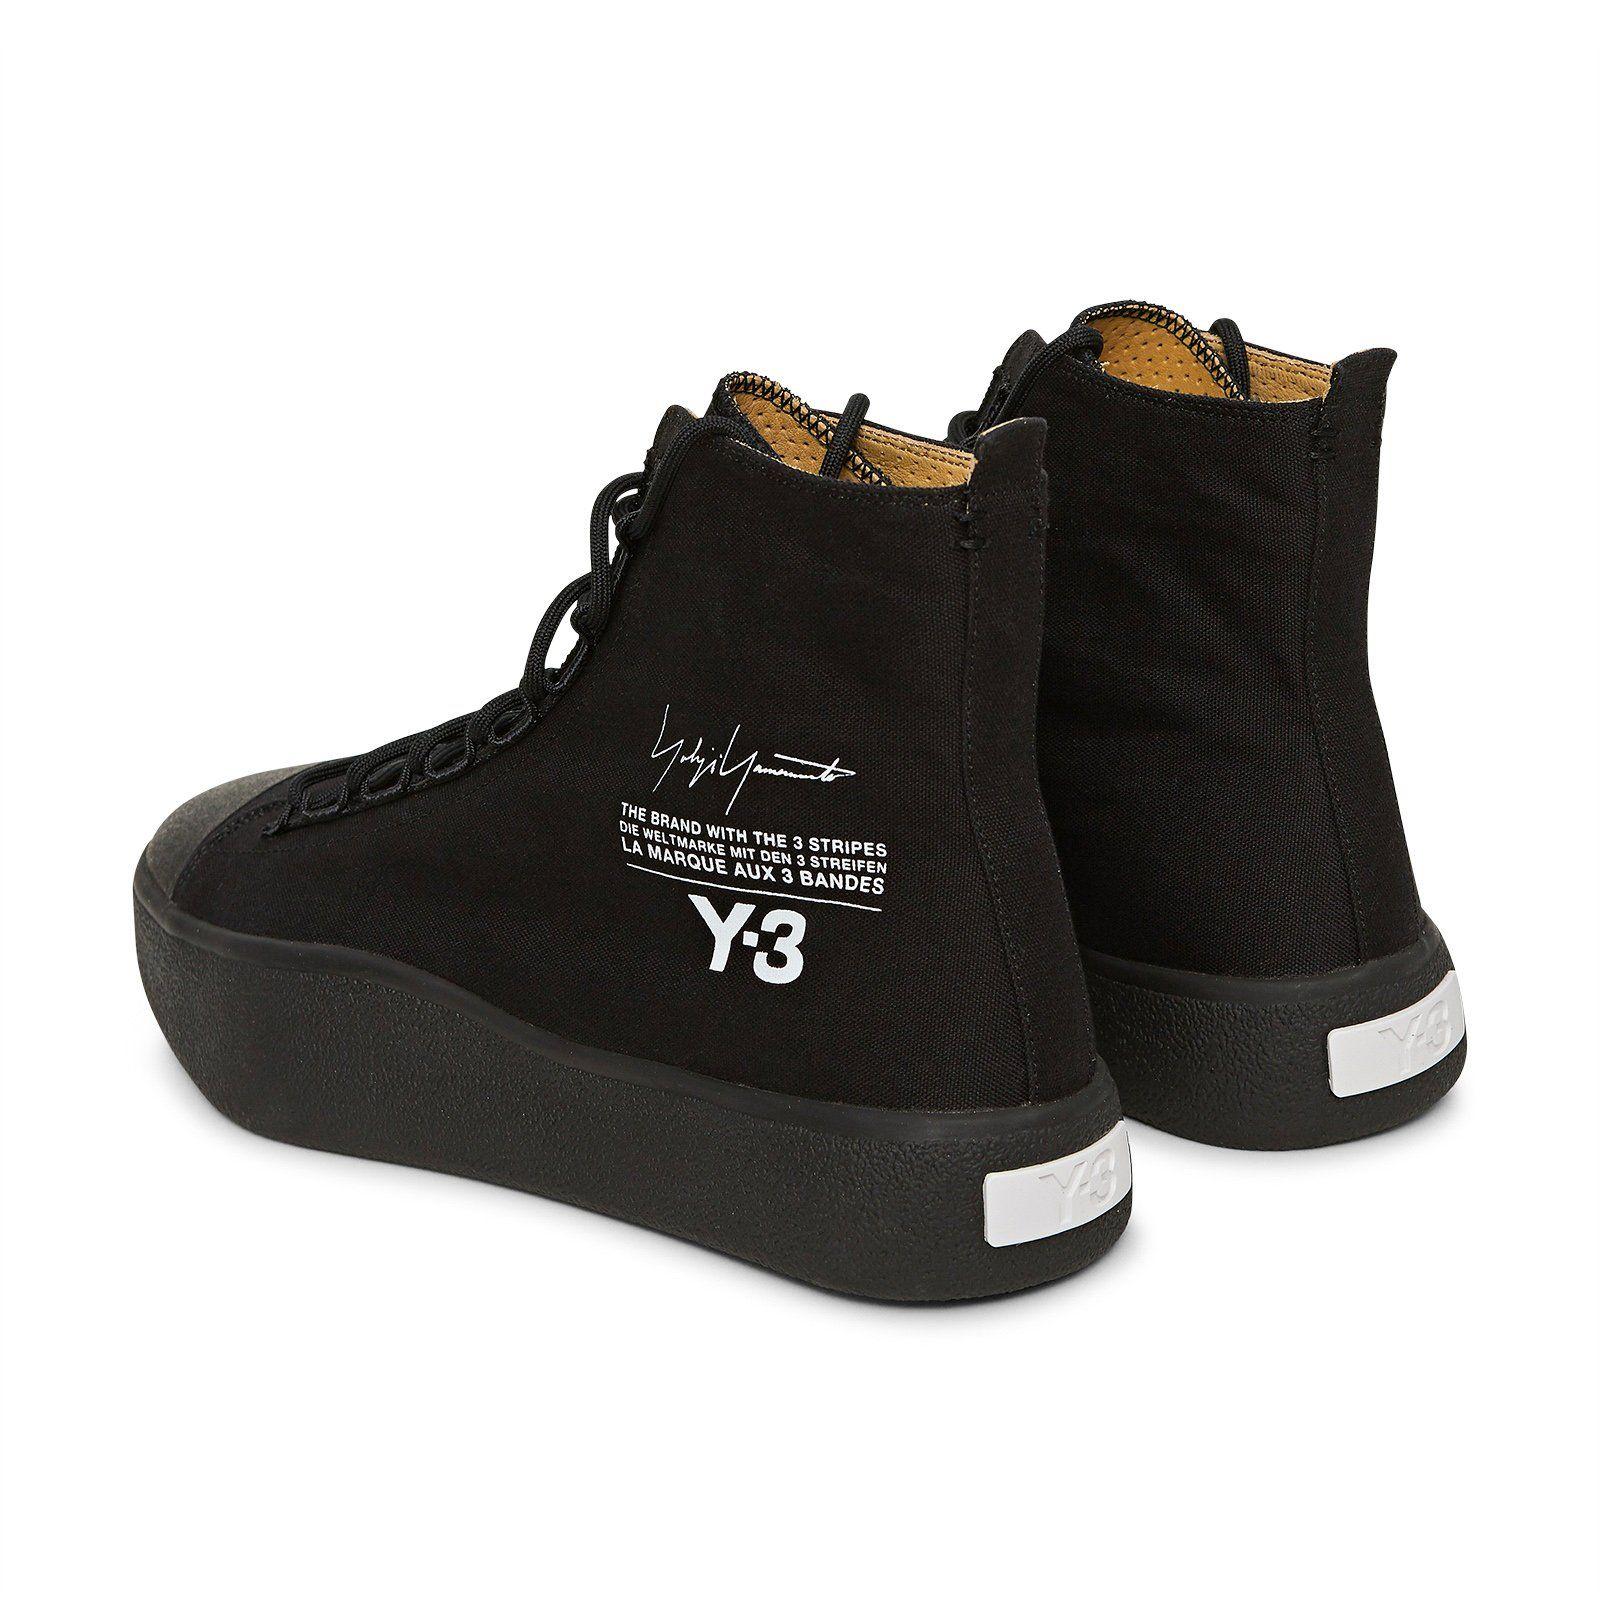 Bashyo scarpe nucleo nero / nucleo bianco calzature alte e adidas